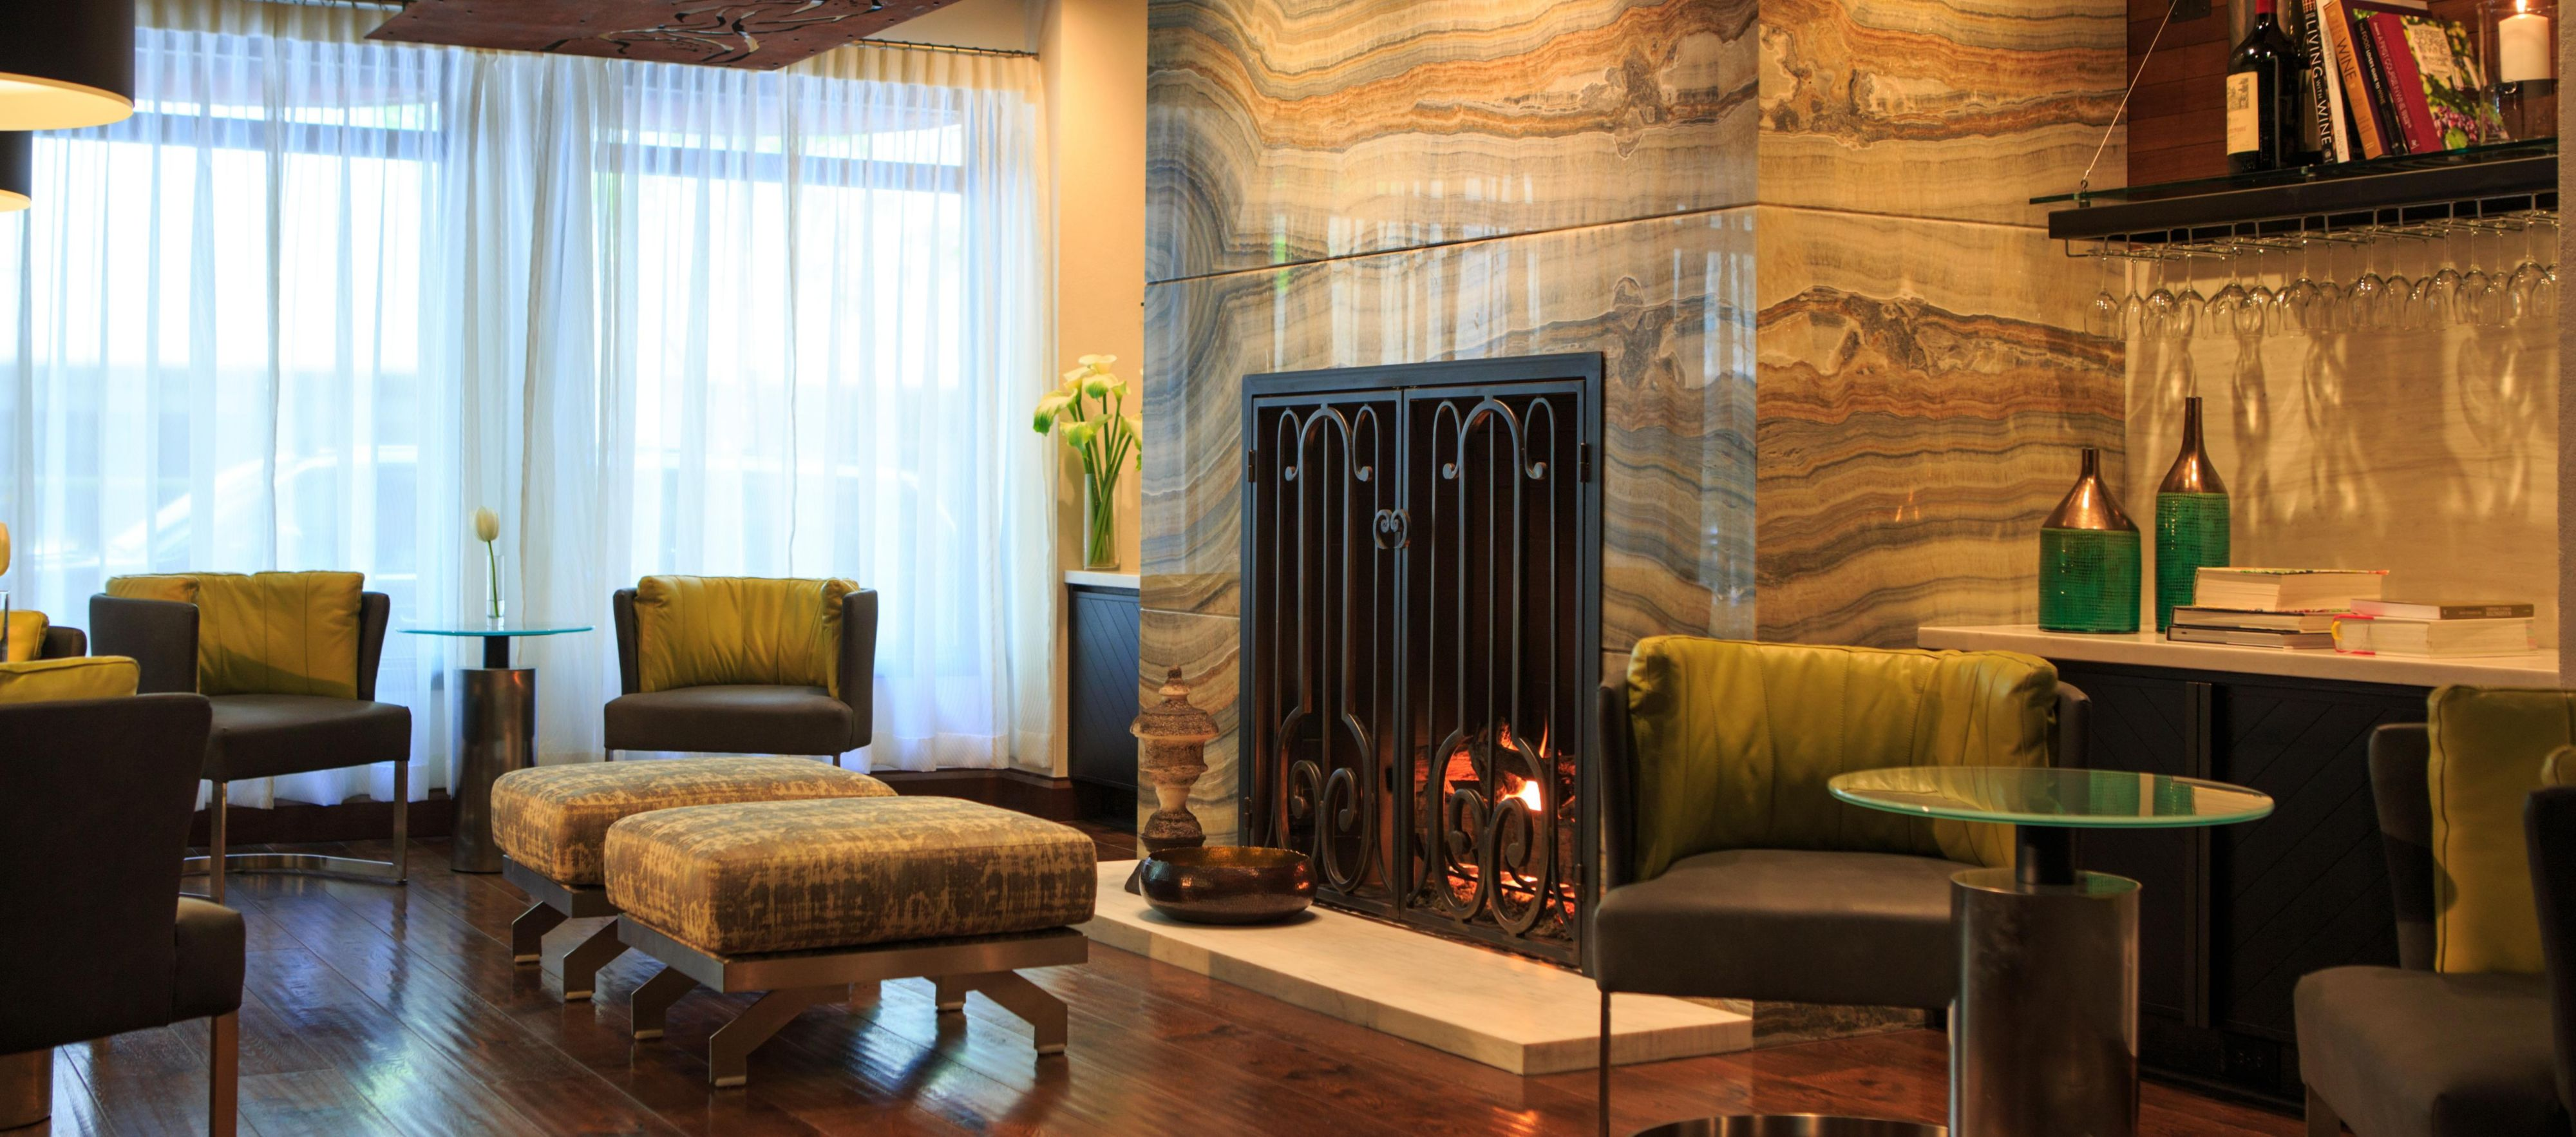 Kimpton Seattle 4654521224 34x15 Hotel Vintage